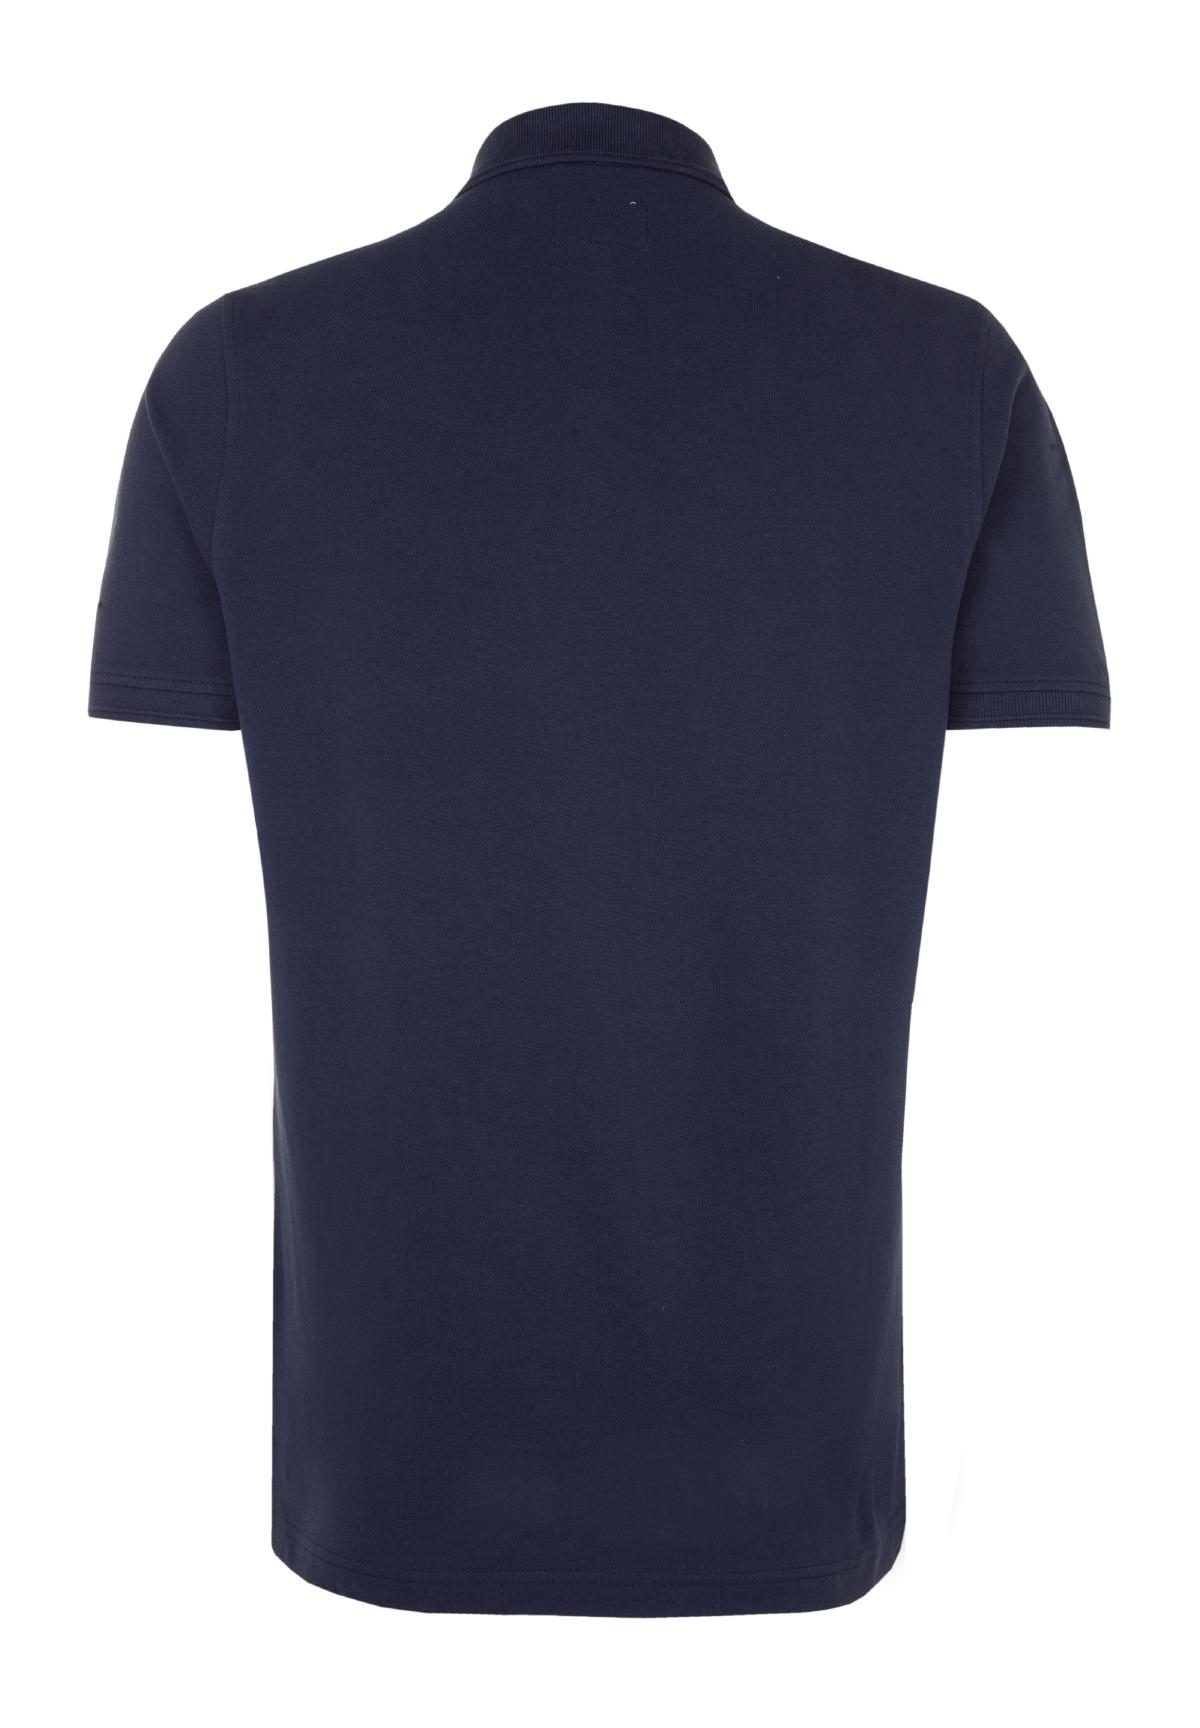 Camel-Active-Herren-Shirt-Poloshirt-Pique-Regular-Fit-NEU Indexbild 23